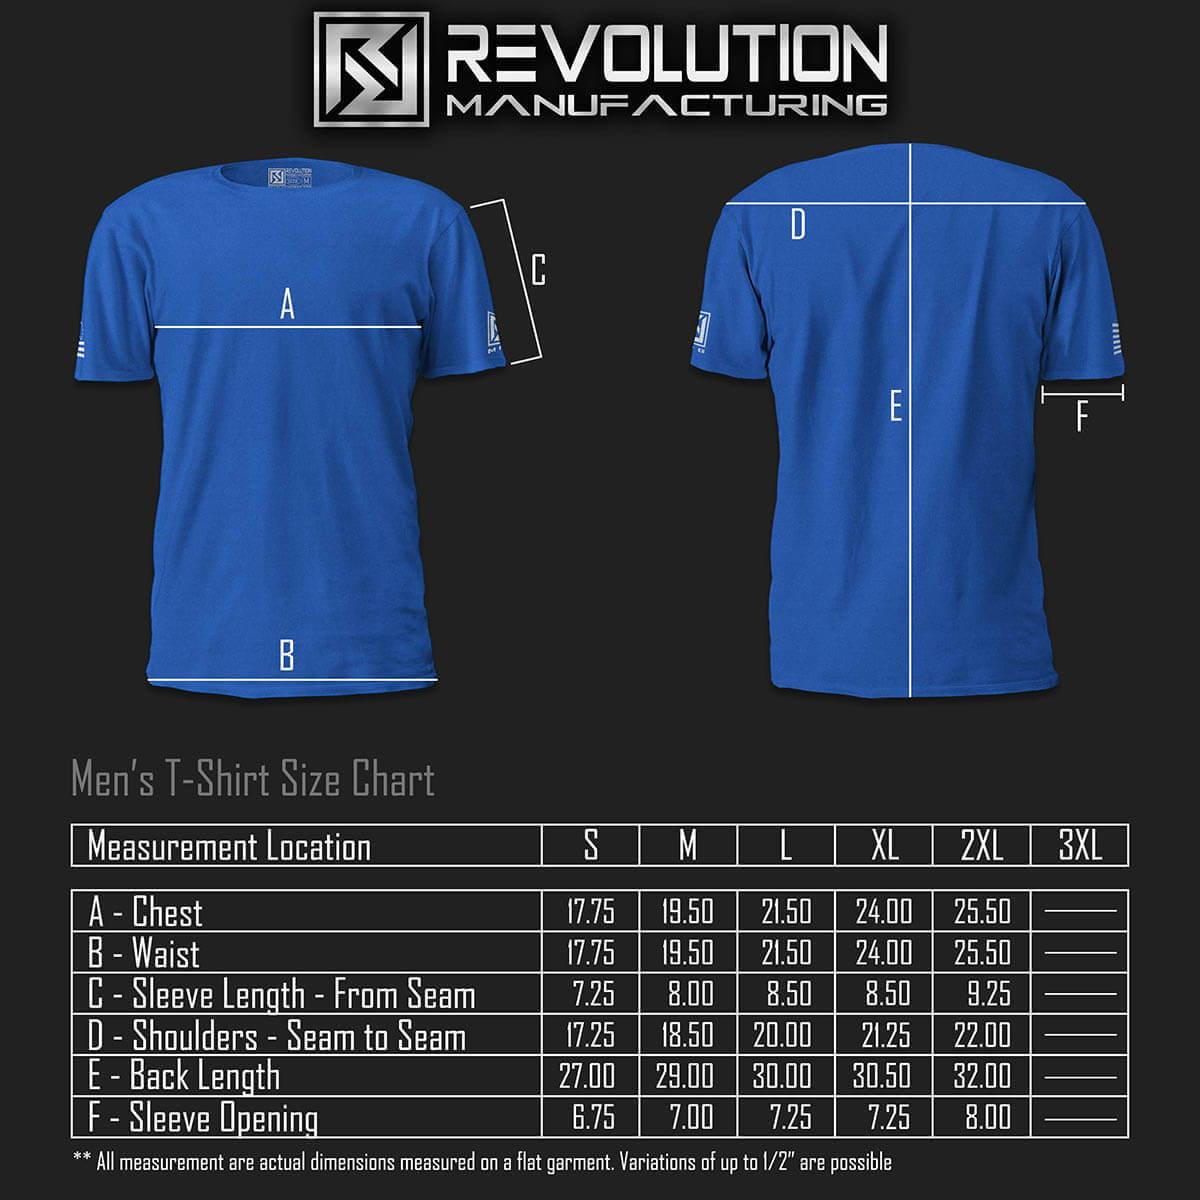 Revolution Mfg American Made Men's T-Shirt Size Chart